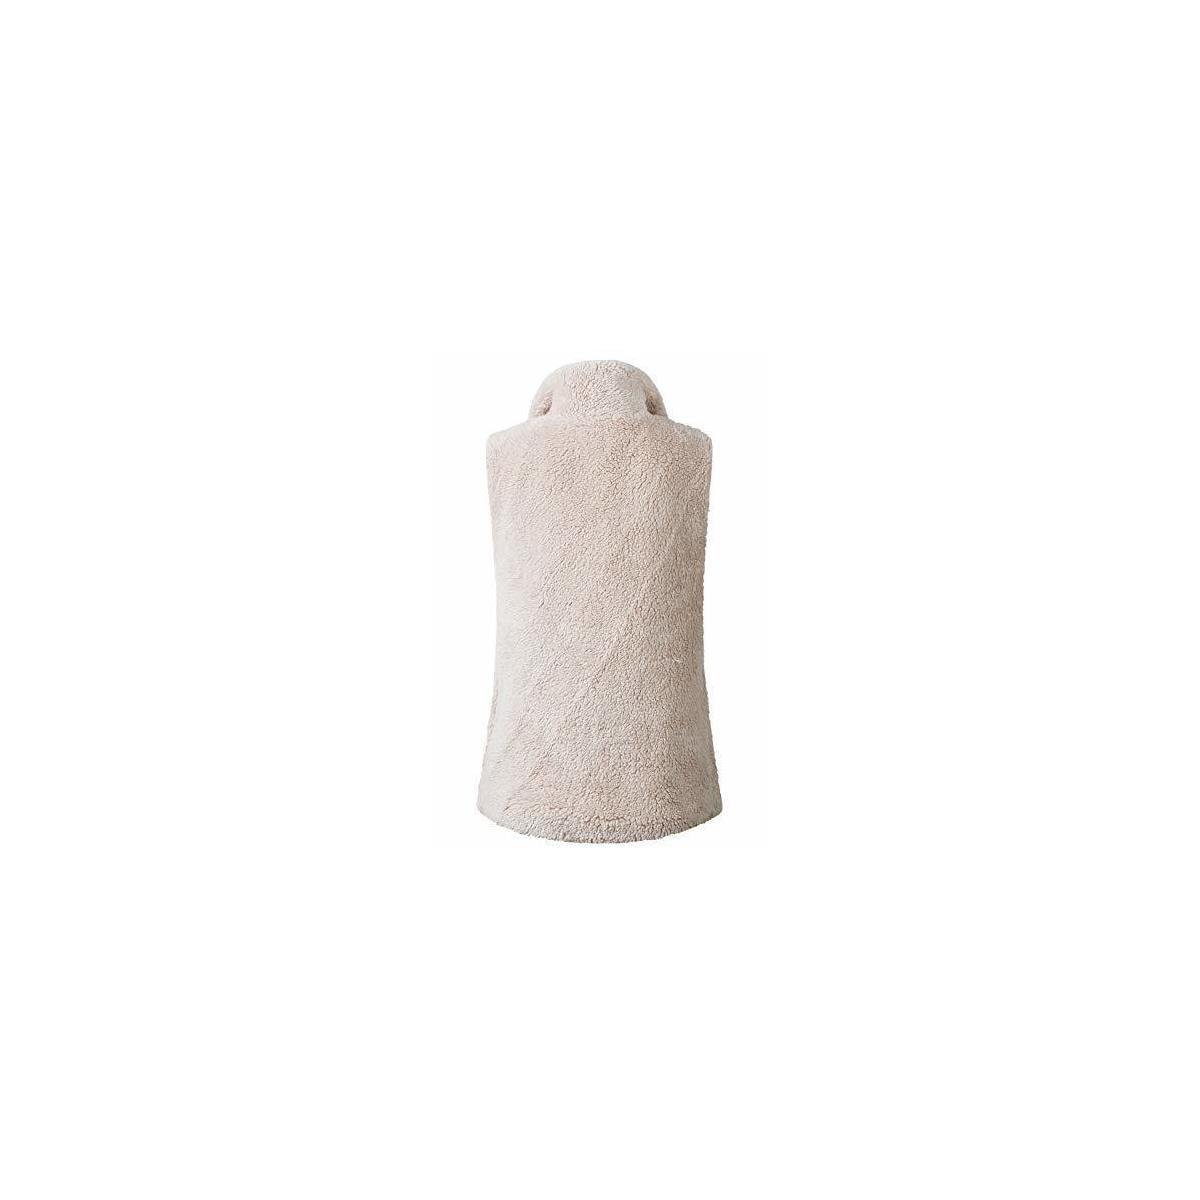 Women's Casual Soft Front Zip Waistcoat Sleeveless Lightweight Warm Fuzzy Sherpa Fleece Vest with Pockets